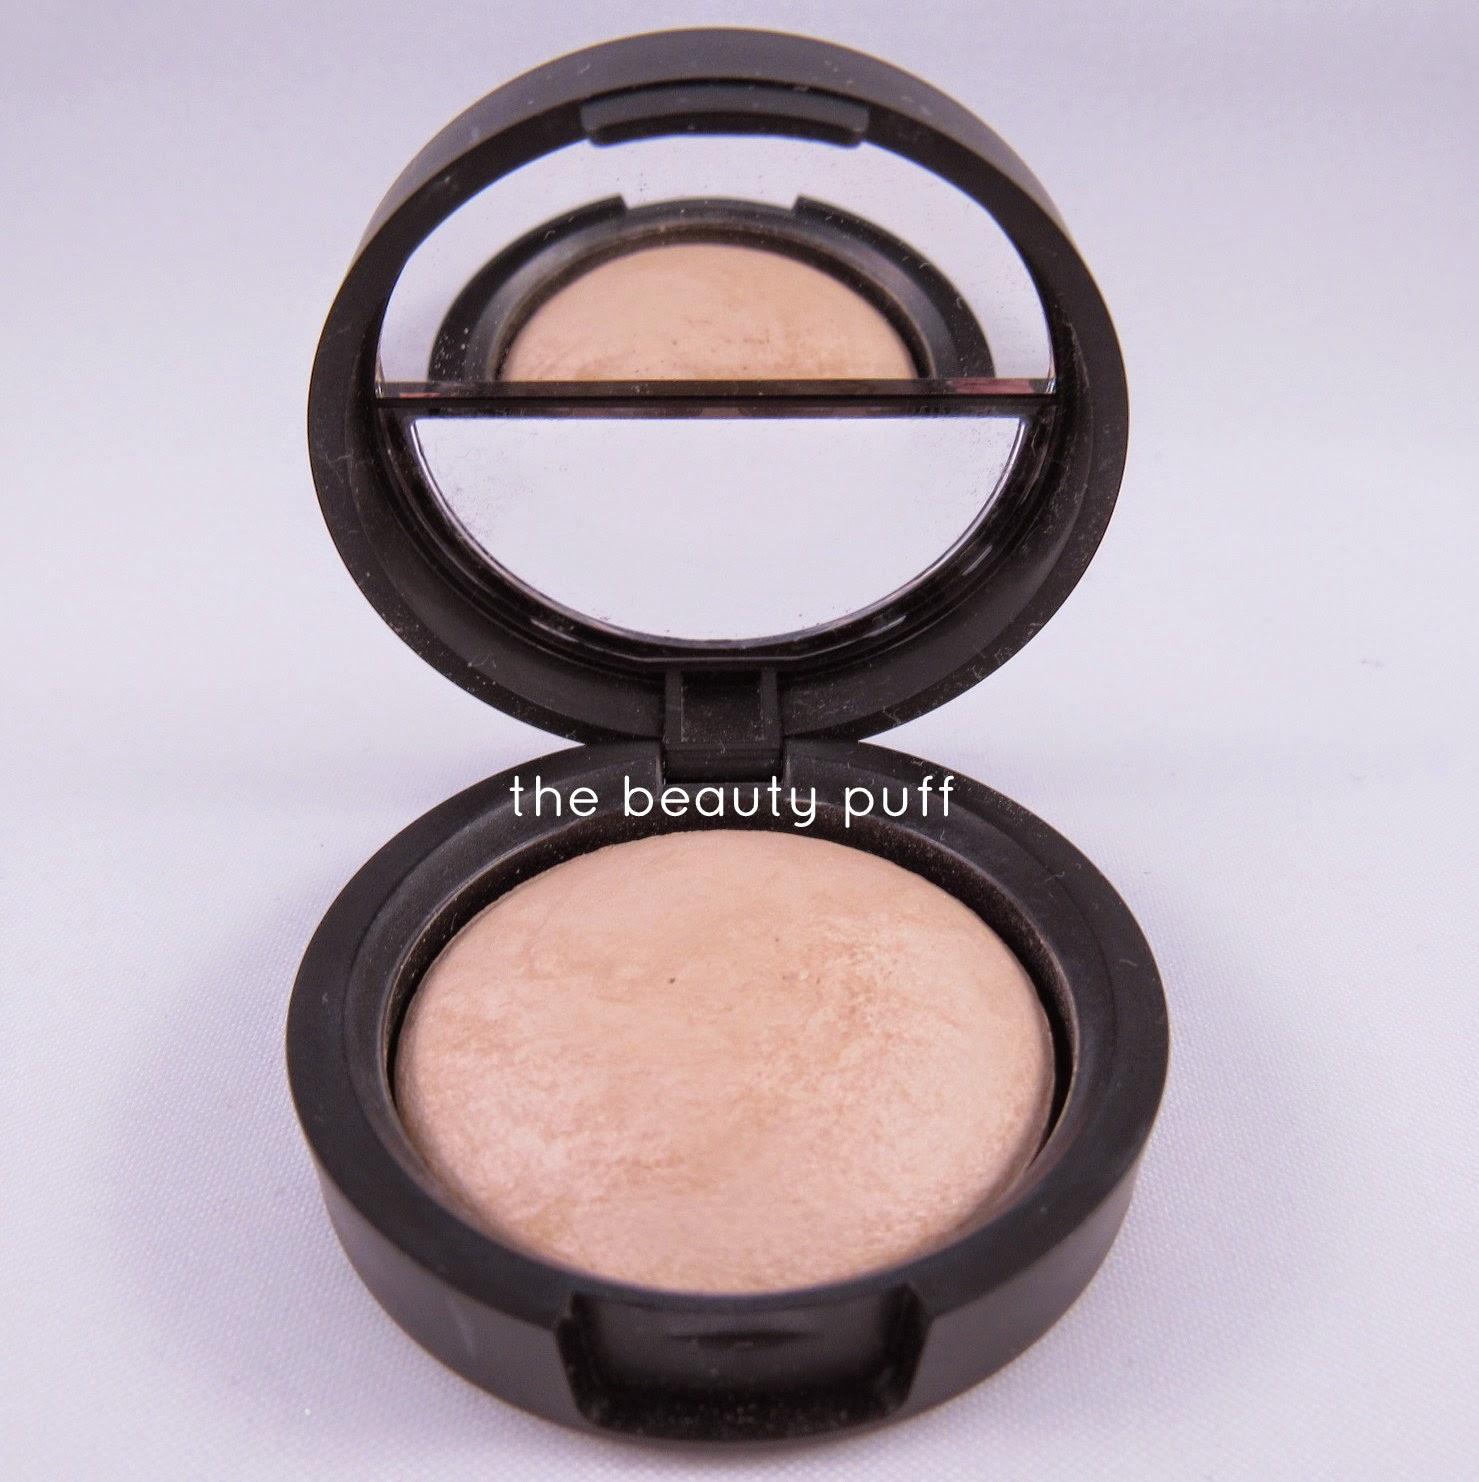 laura geller french vanilla highlight - the beauty puff